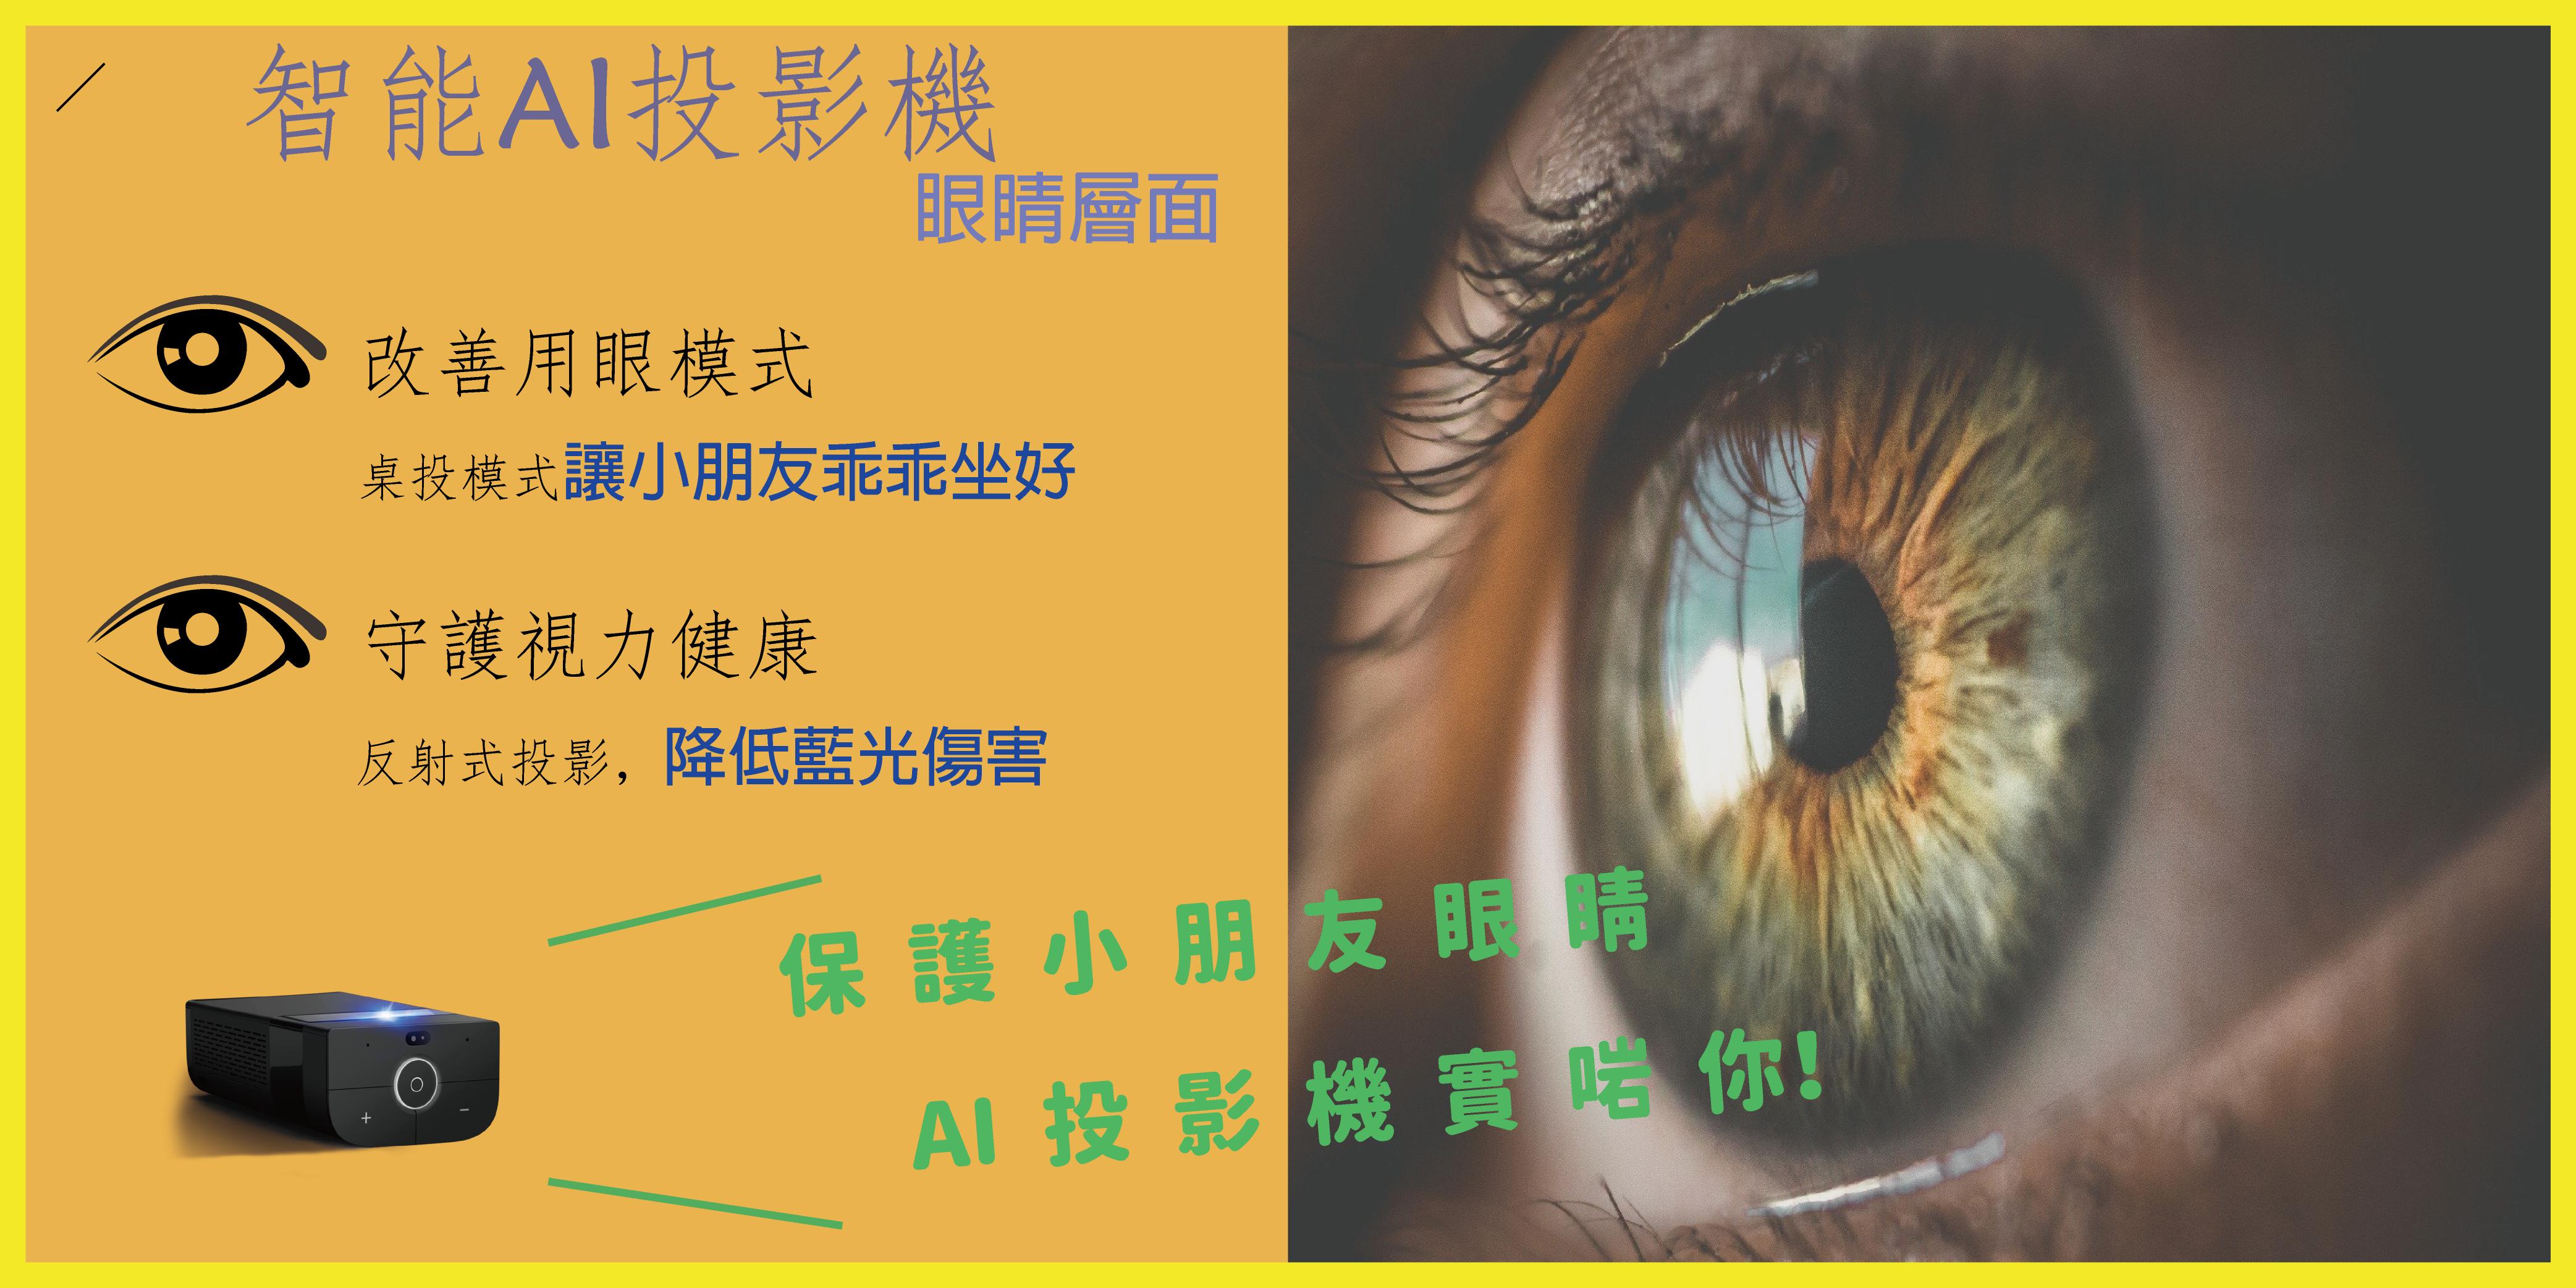 AI 觸控智能投影機 Hachi Infinite M1